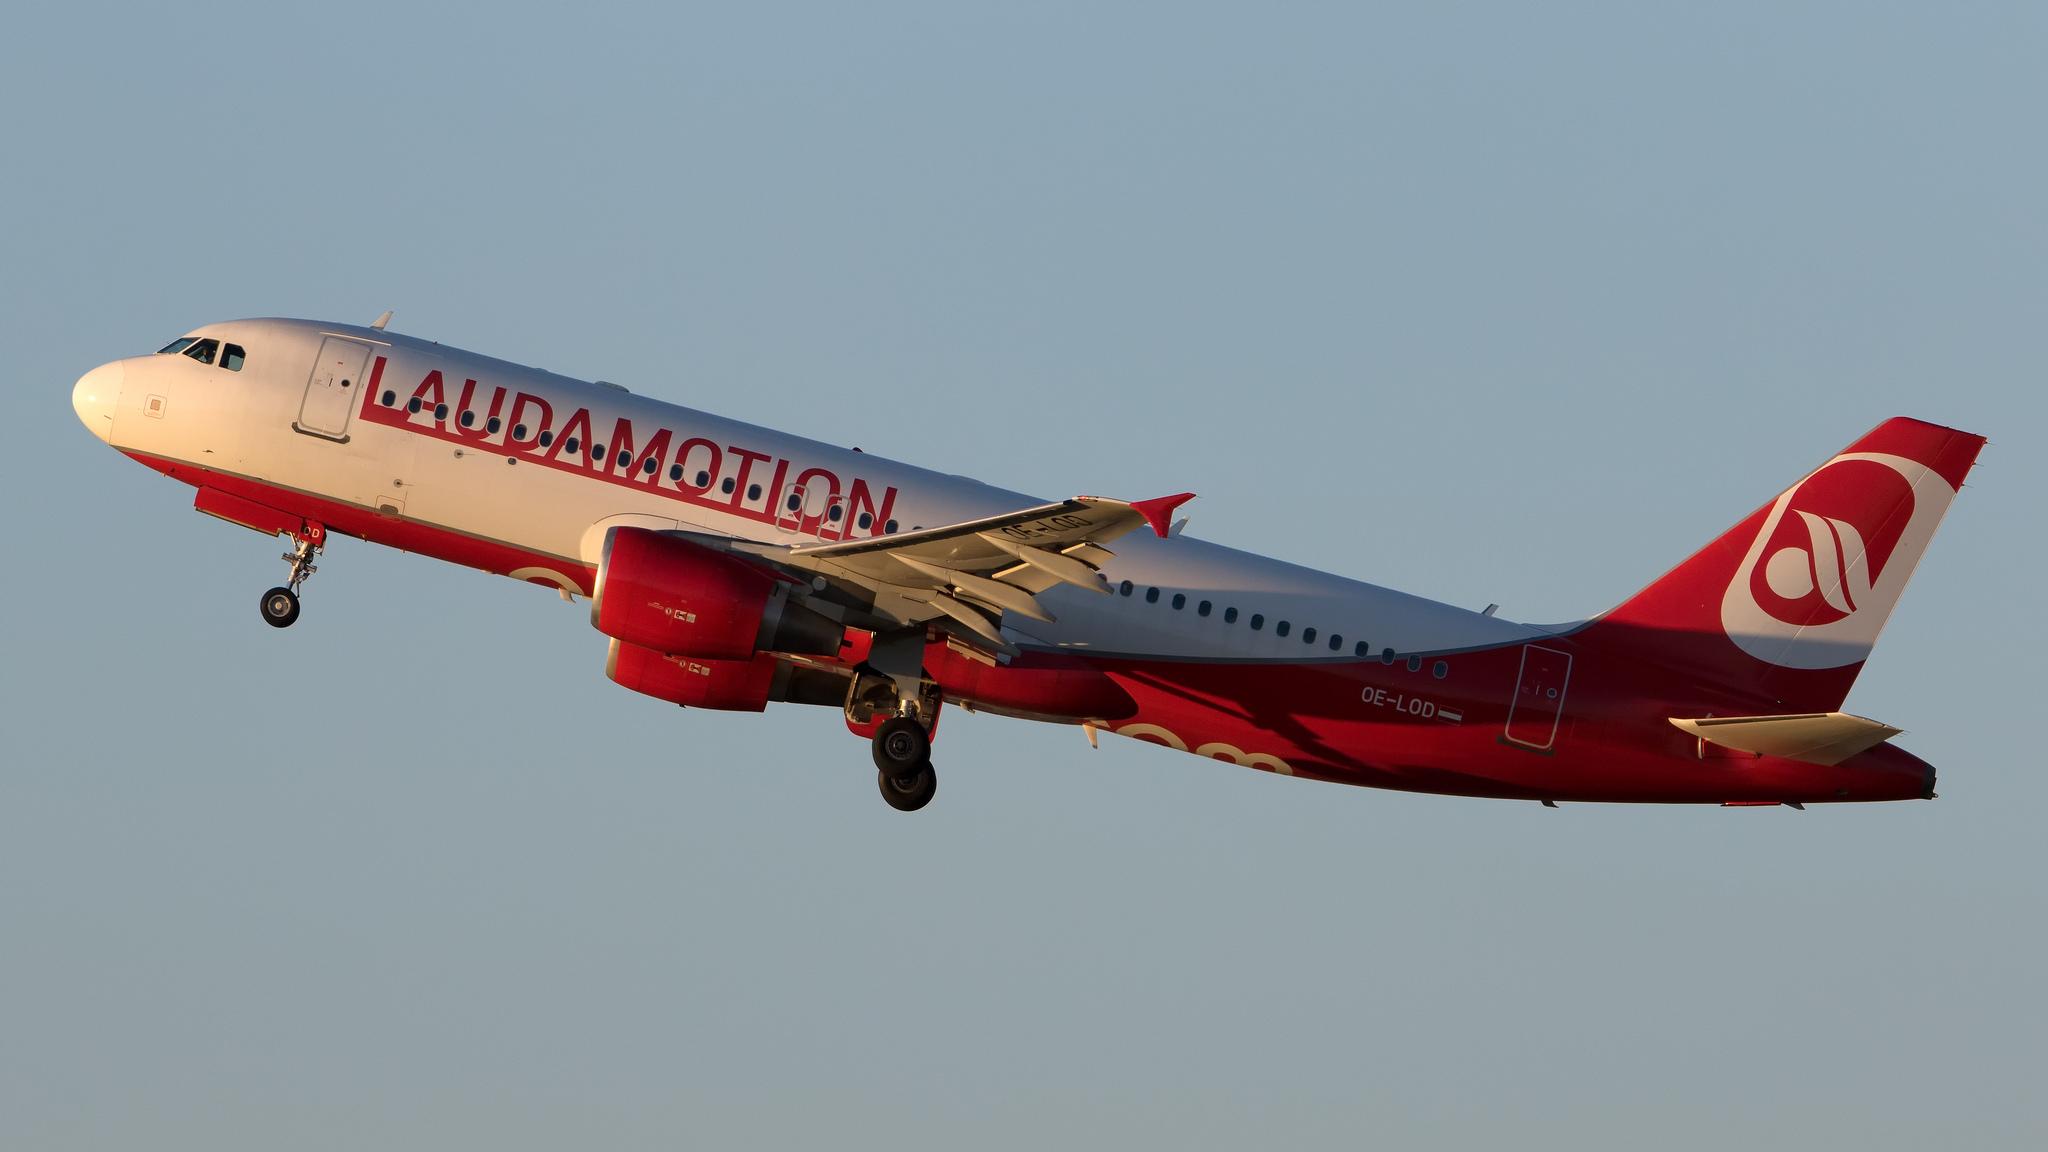 Laudamotion Airbus A320 OE-LOD